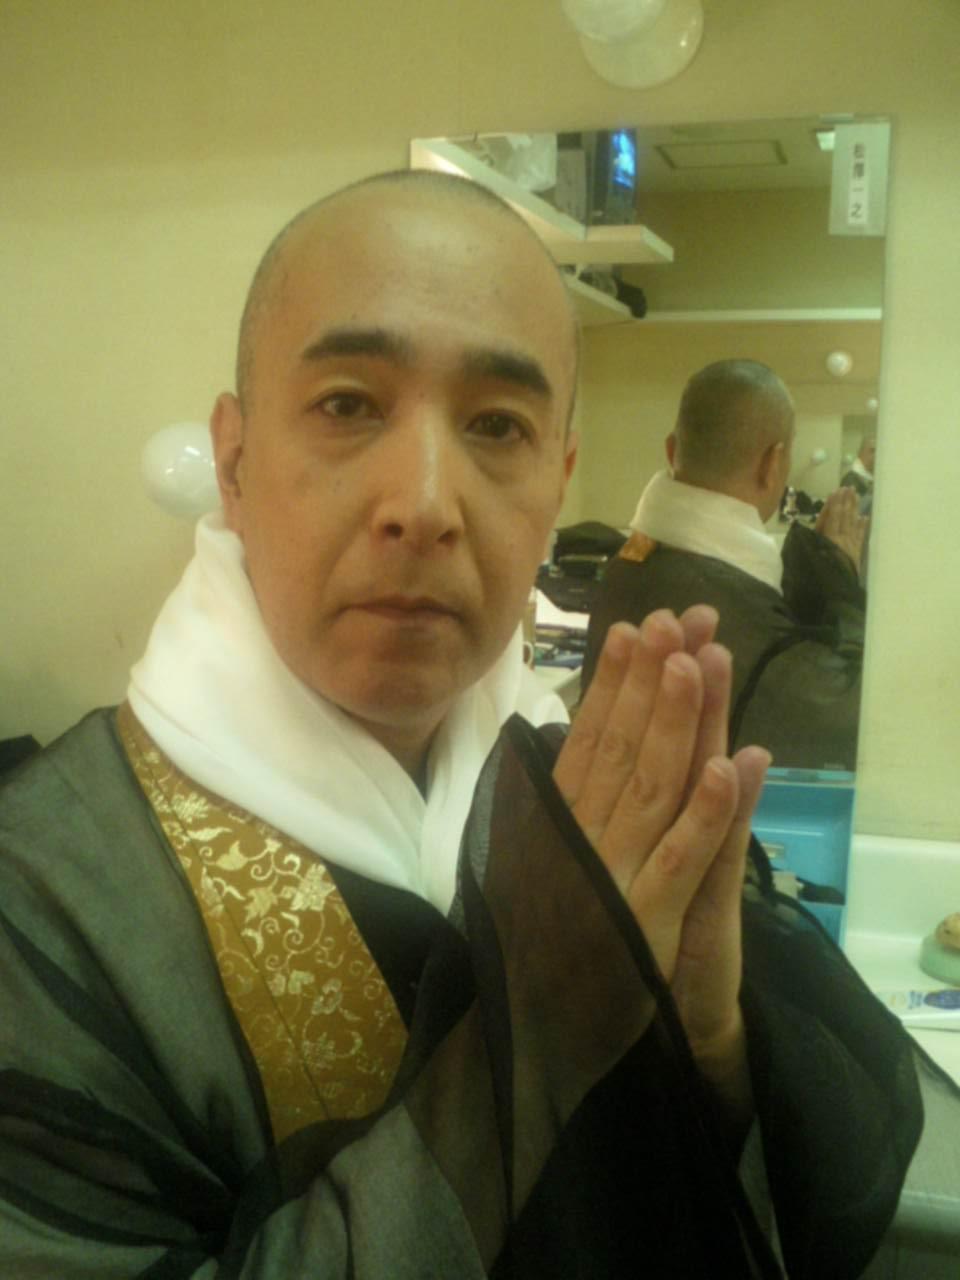 松澤一之,妹 ストーカー,息子 俳優,国立市